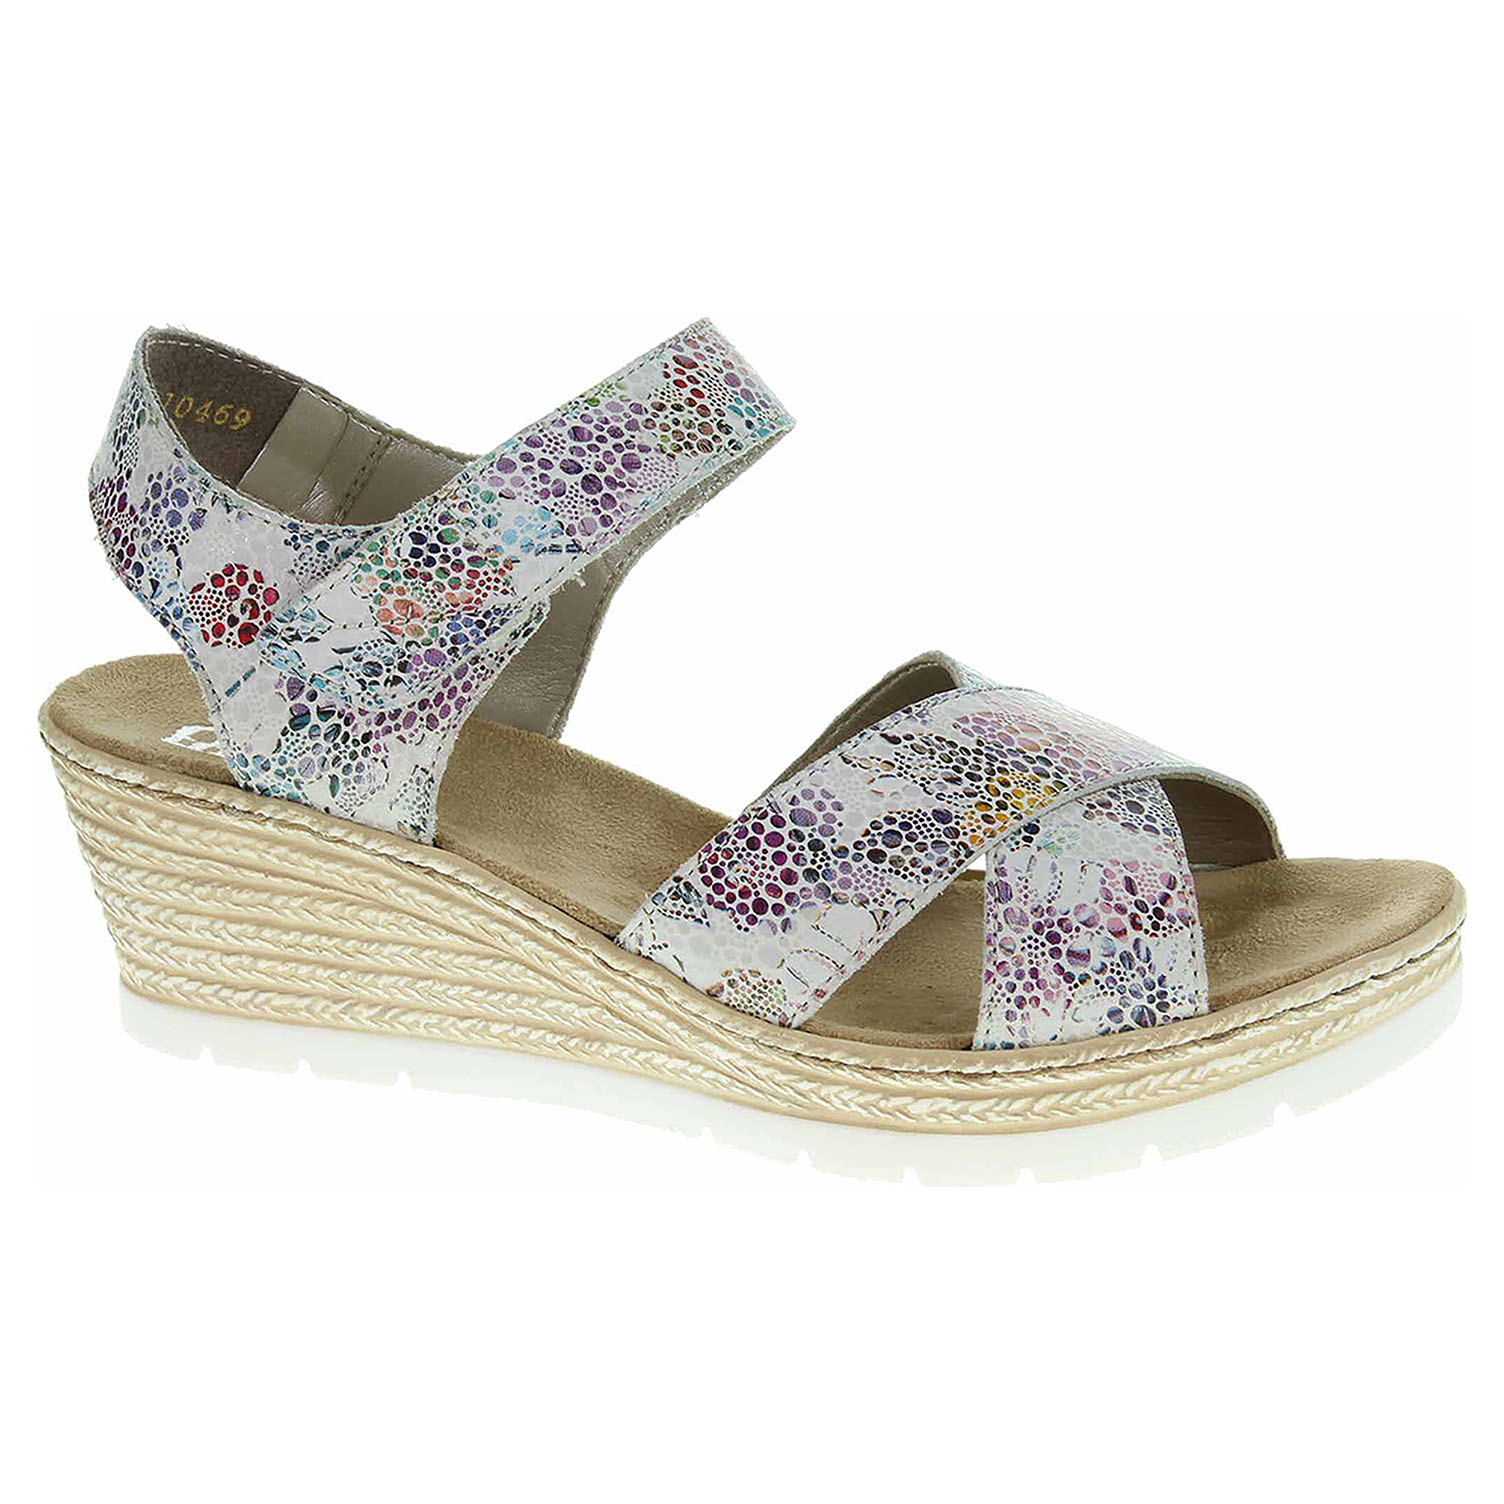 6080da004fa14 Dámske sandále Rieker 61943-90 multi | REJNOK obuv